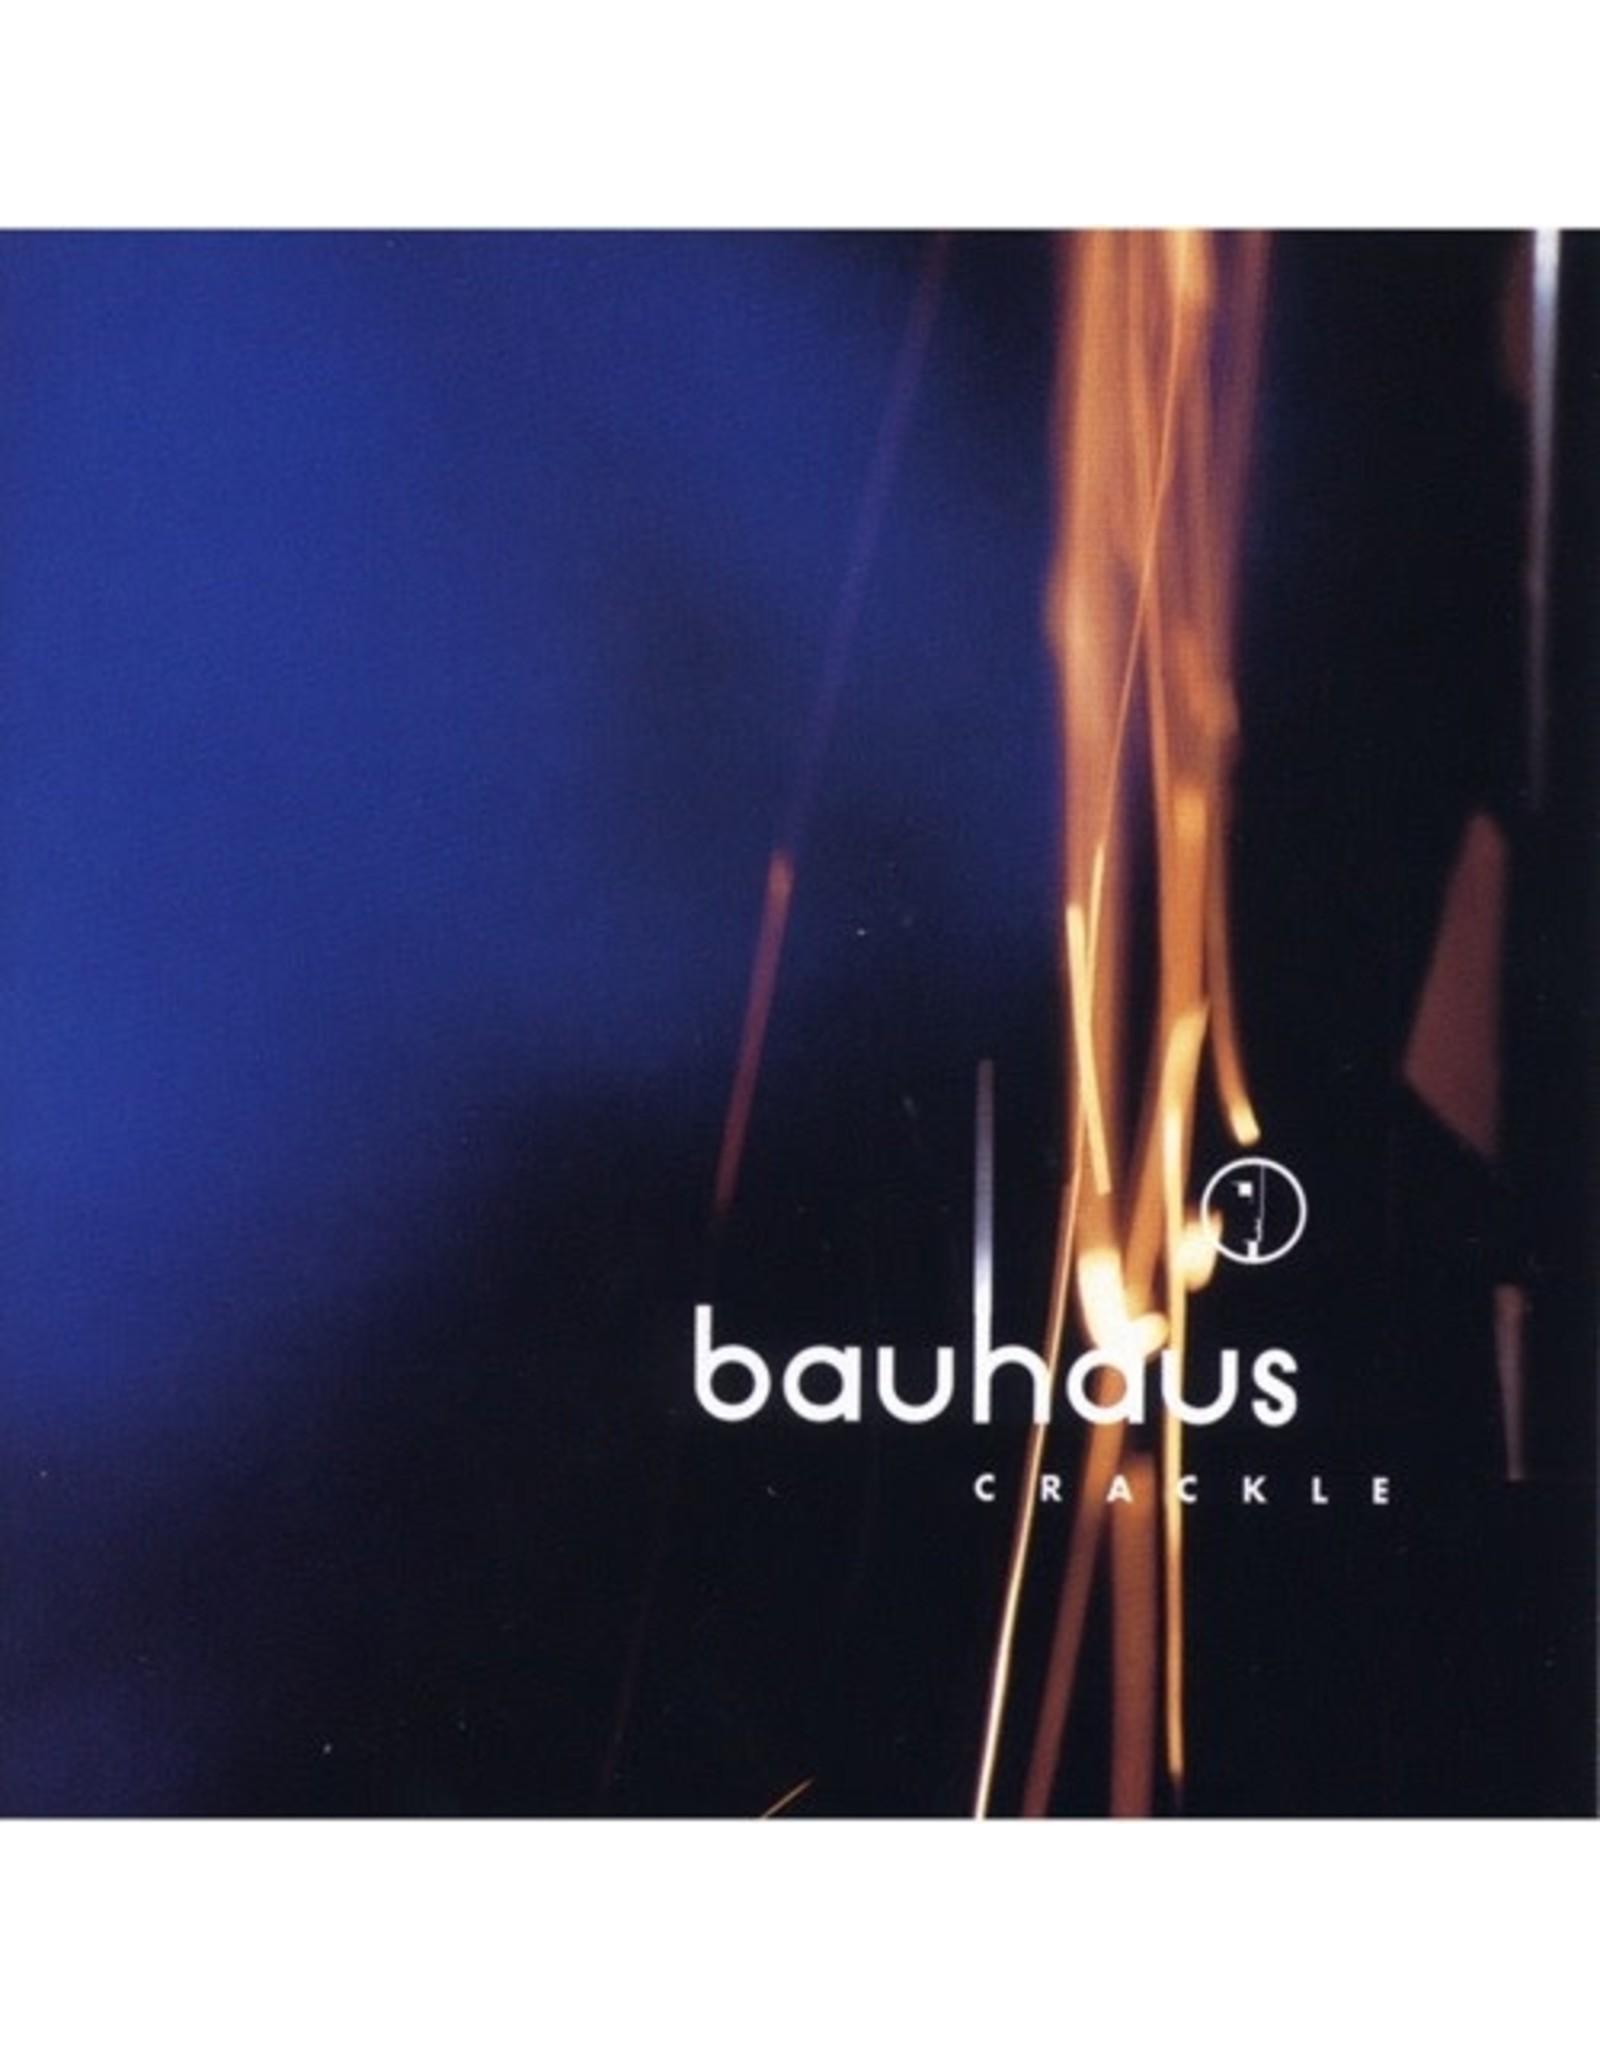 4AD Bauhaus: Crackle LP